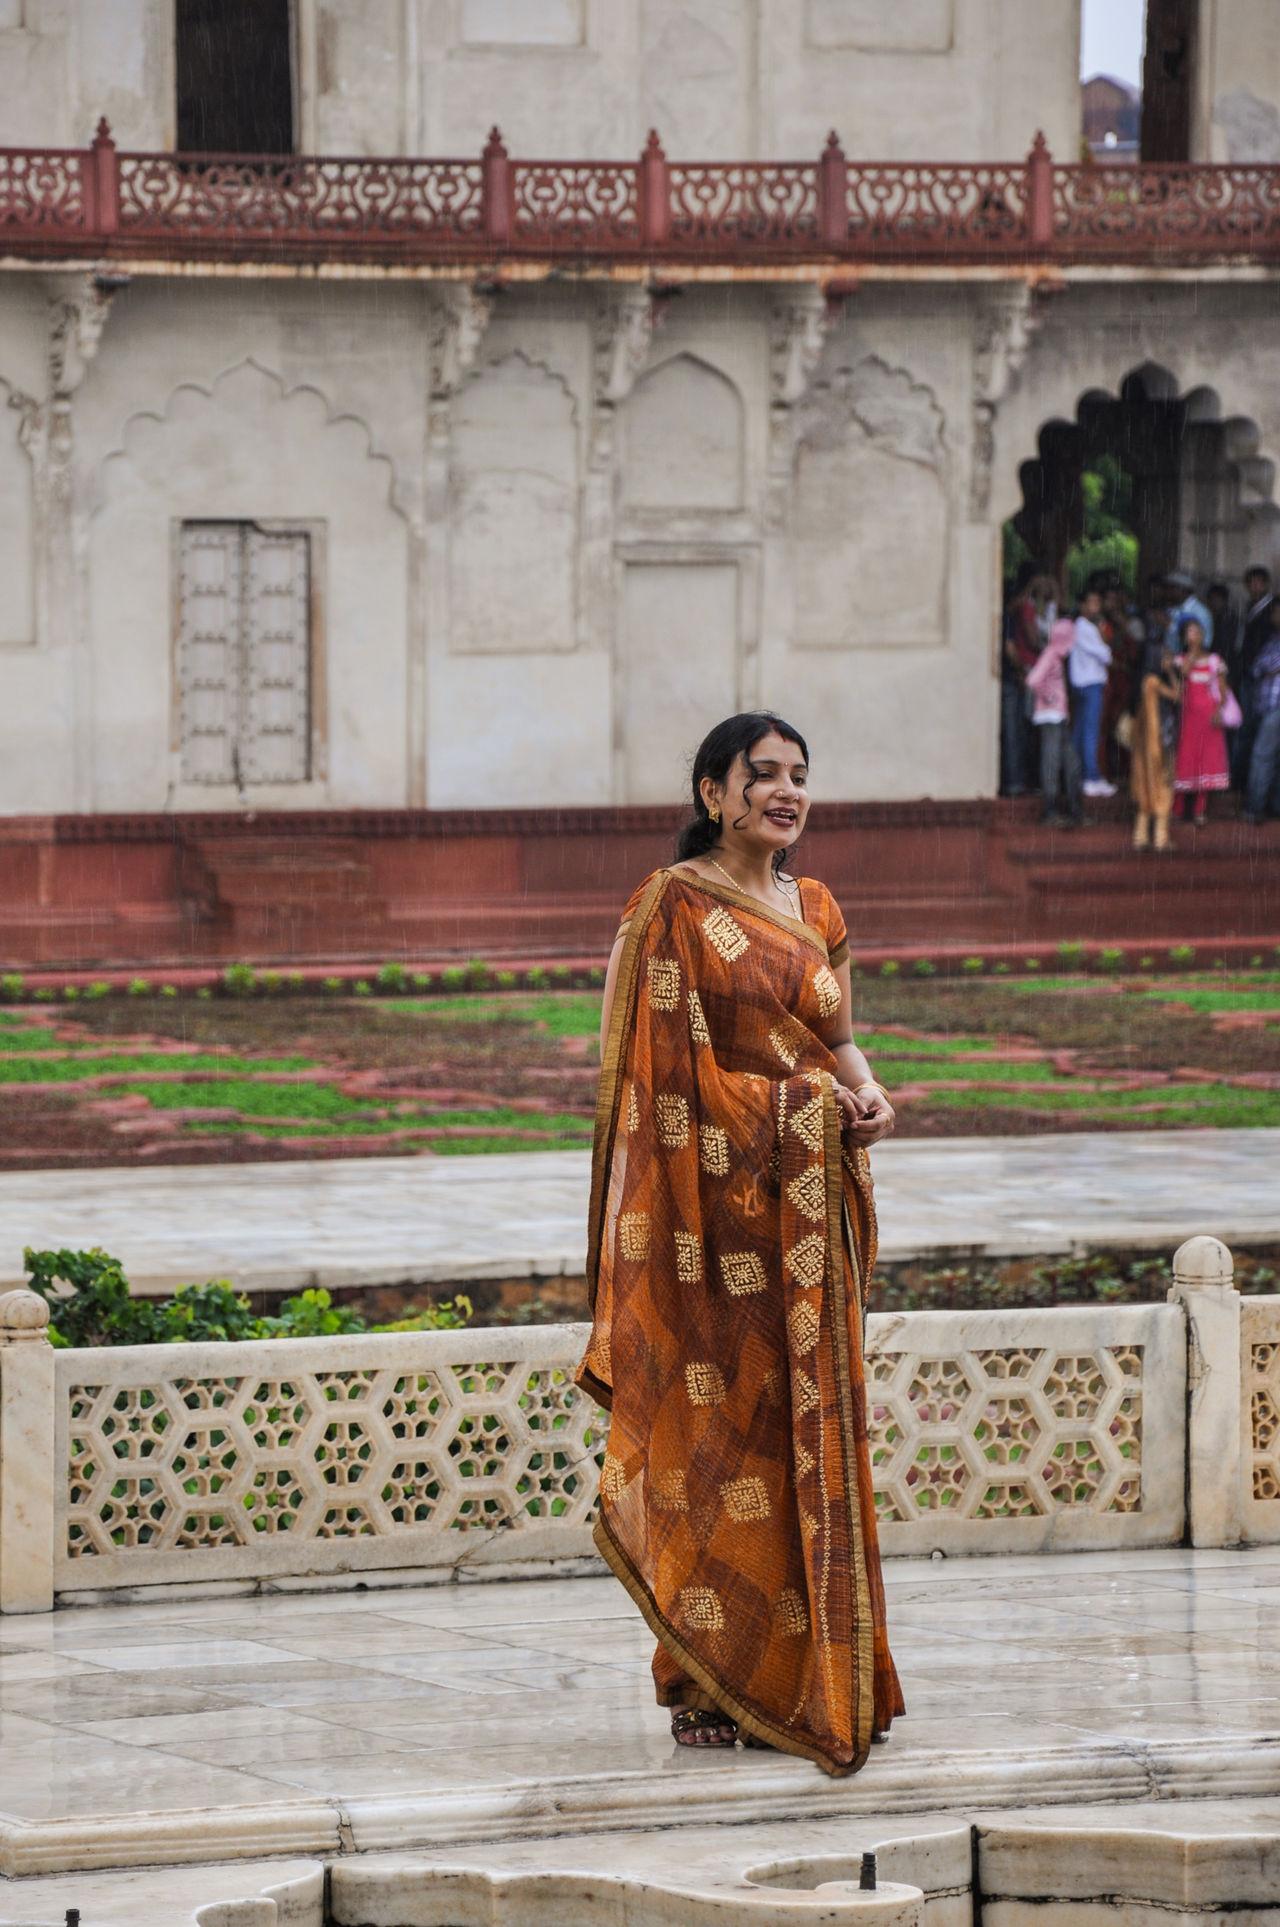 India Indian Women Indian Saree Delhi India Delhi. Indian woman posing for photos.